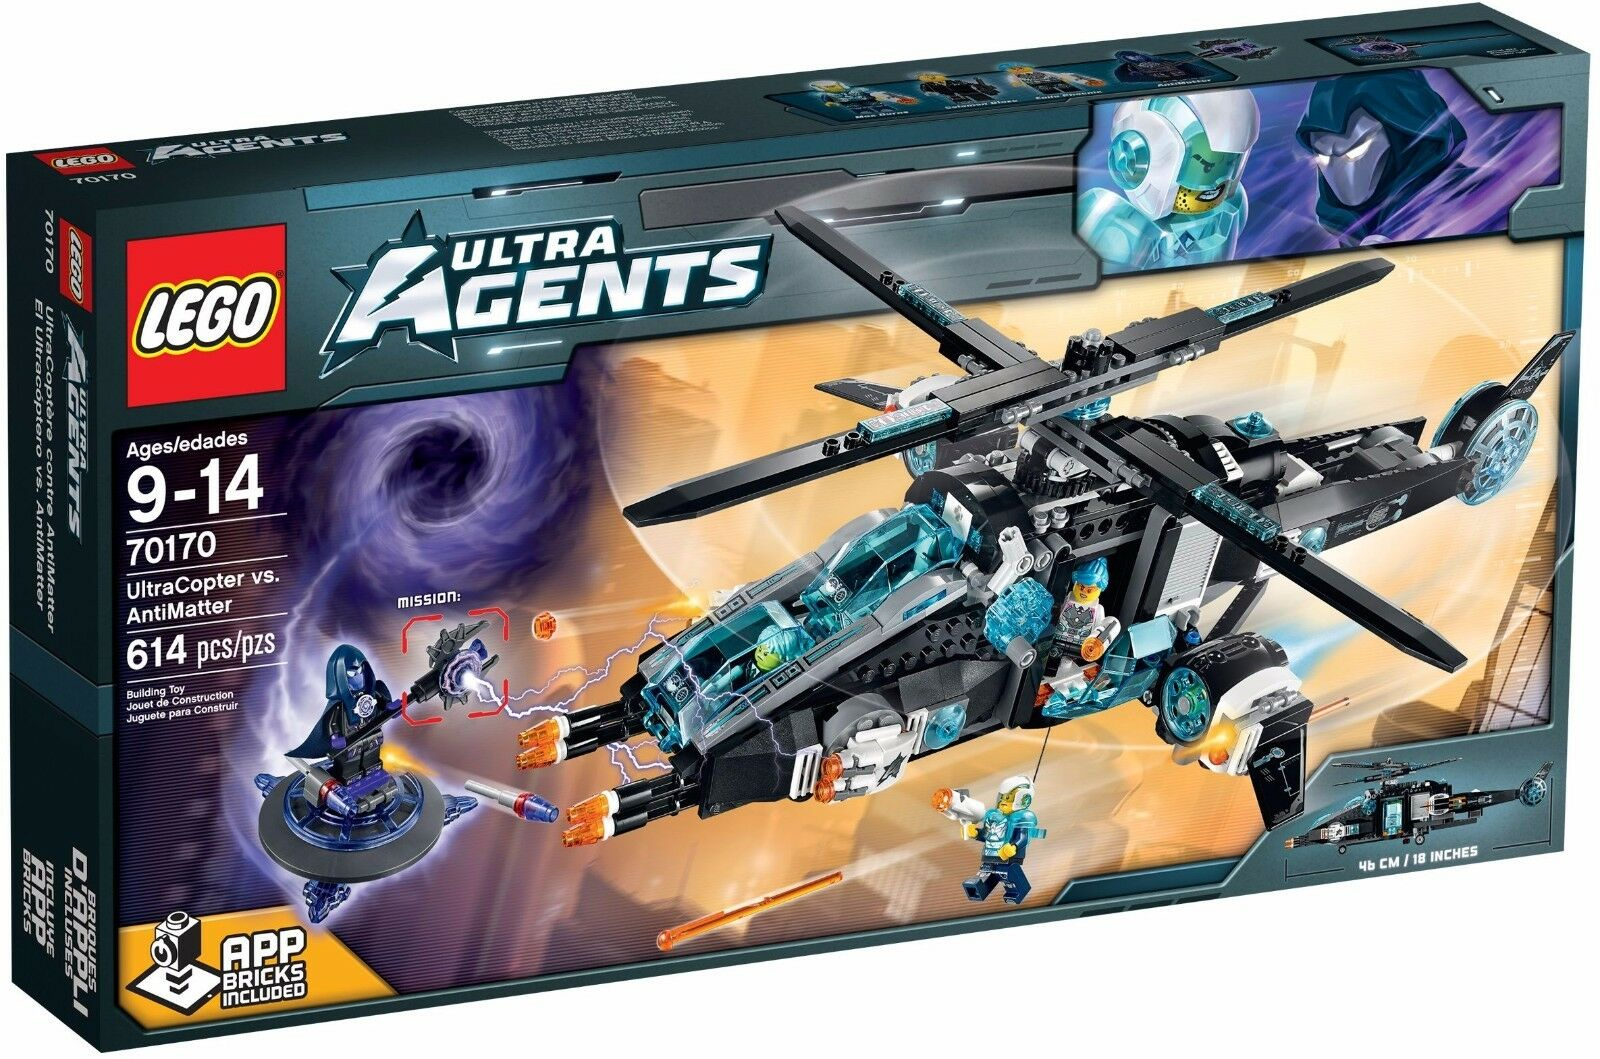 Lego Ultra Agents Ultracopter mot Antimateria ()(pensionerad 2015)(Sällsynt)(NY)